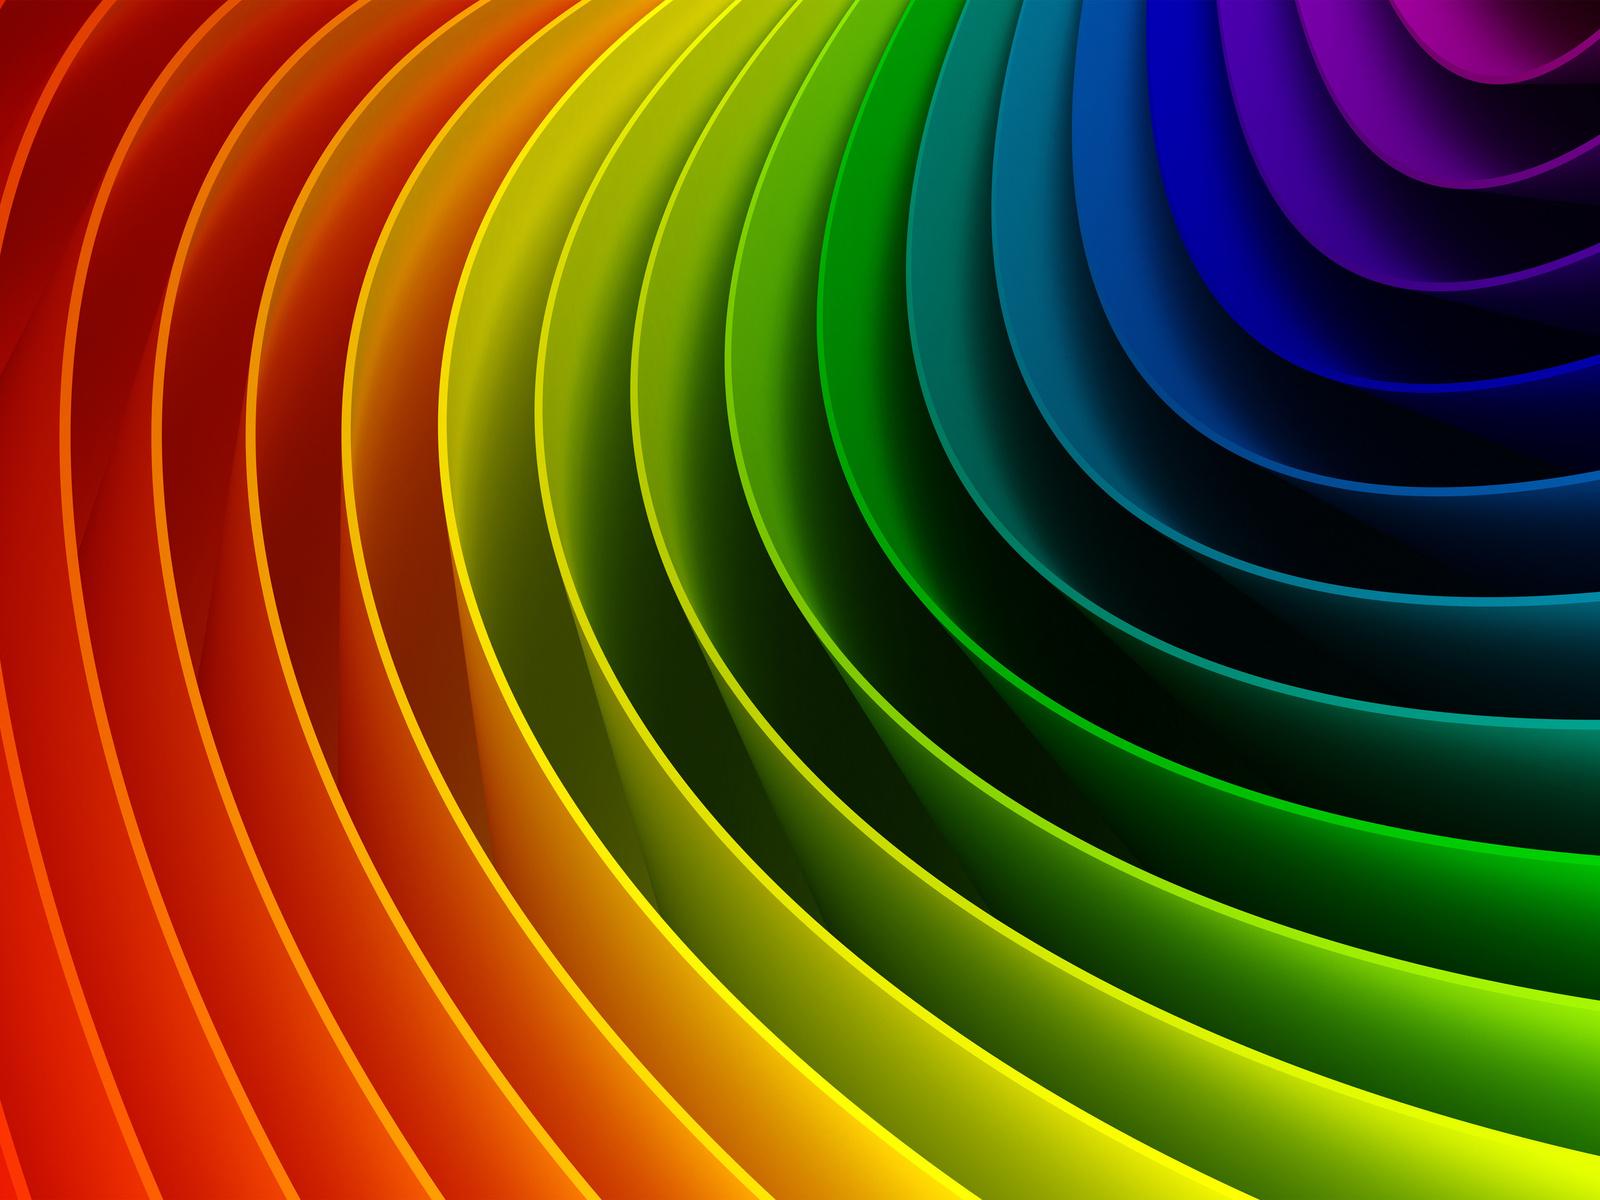 Pin astratto arcobaleno foto sfondi per desktop wallpapers for Sfondi per desktop 3d